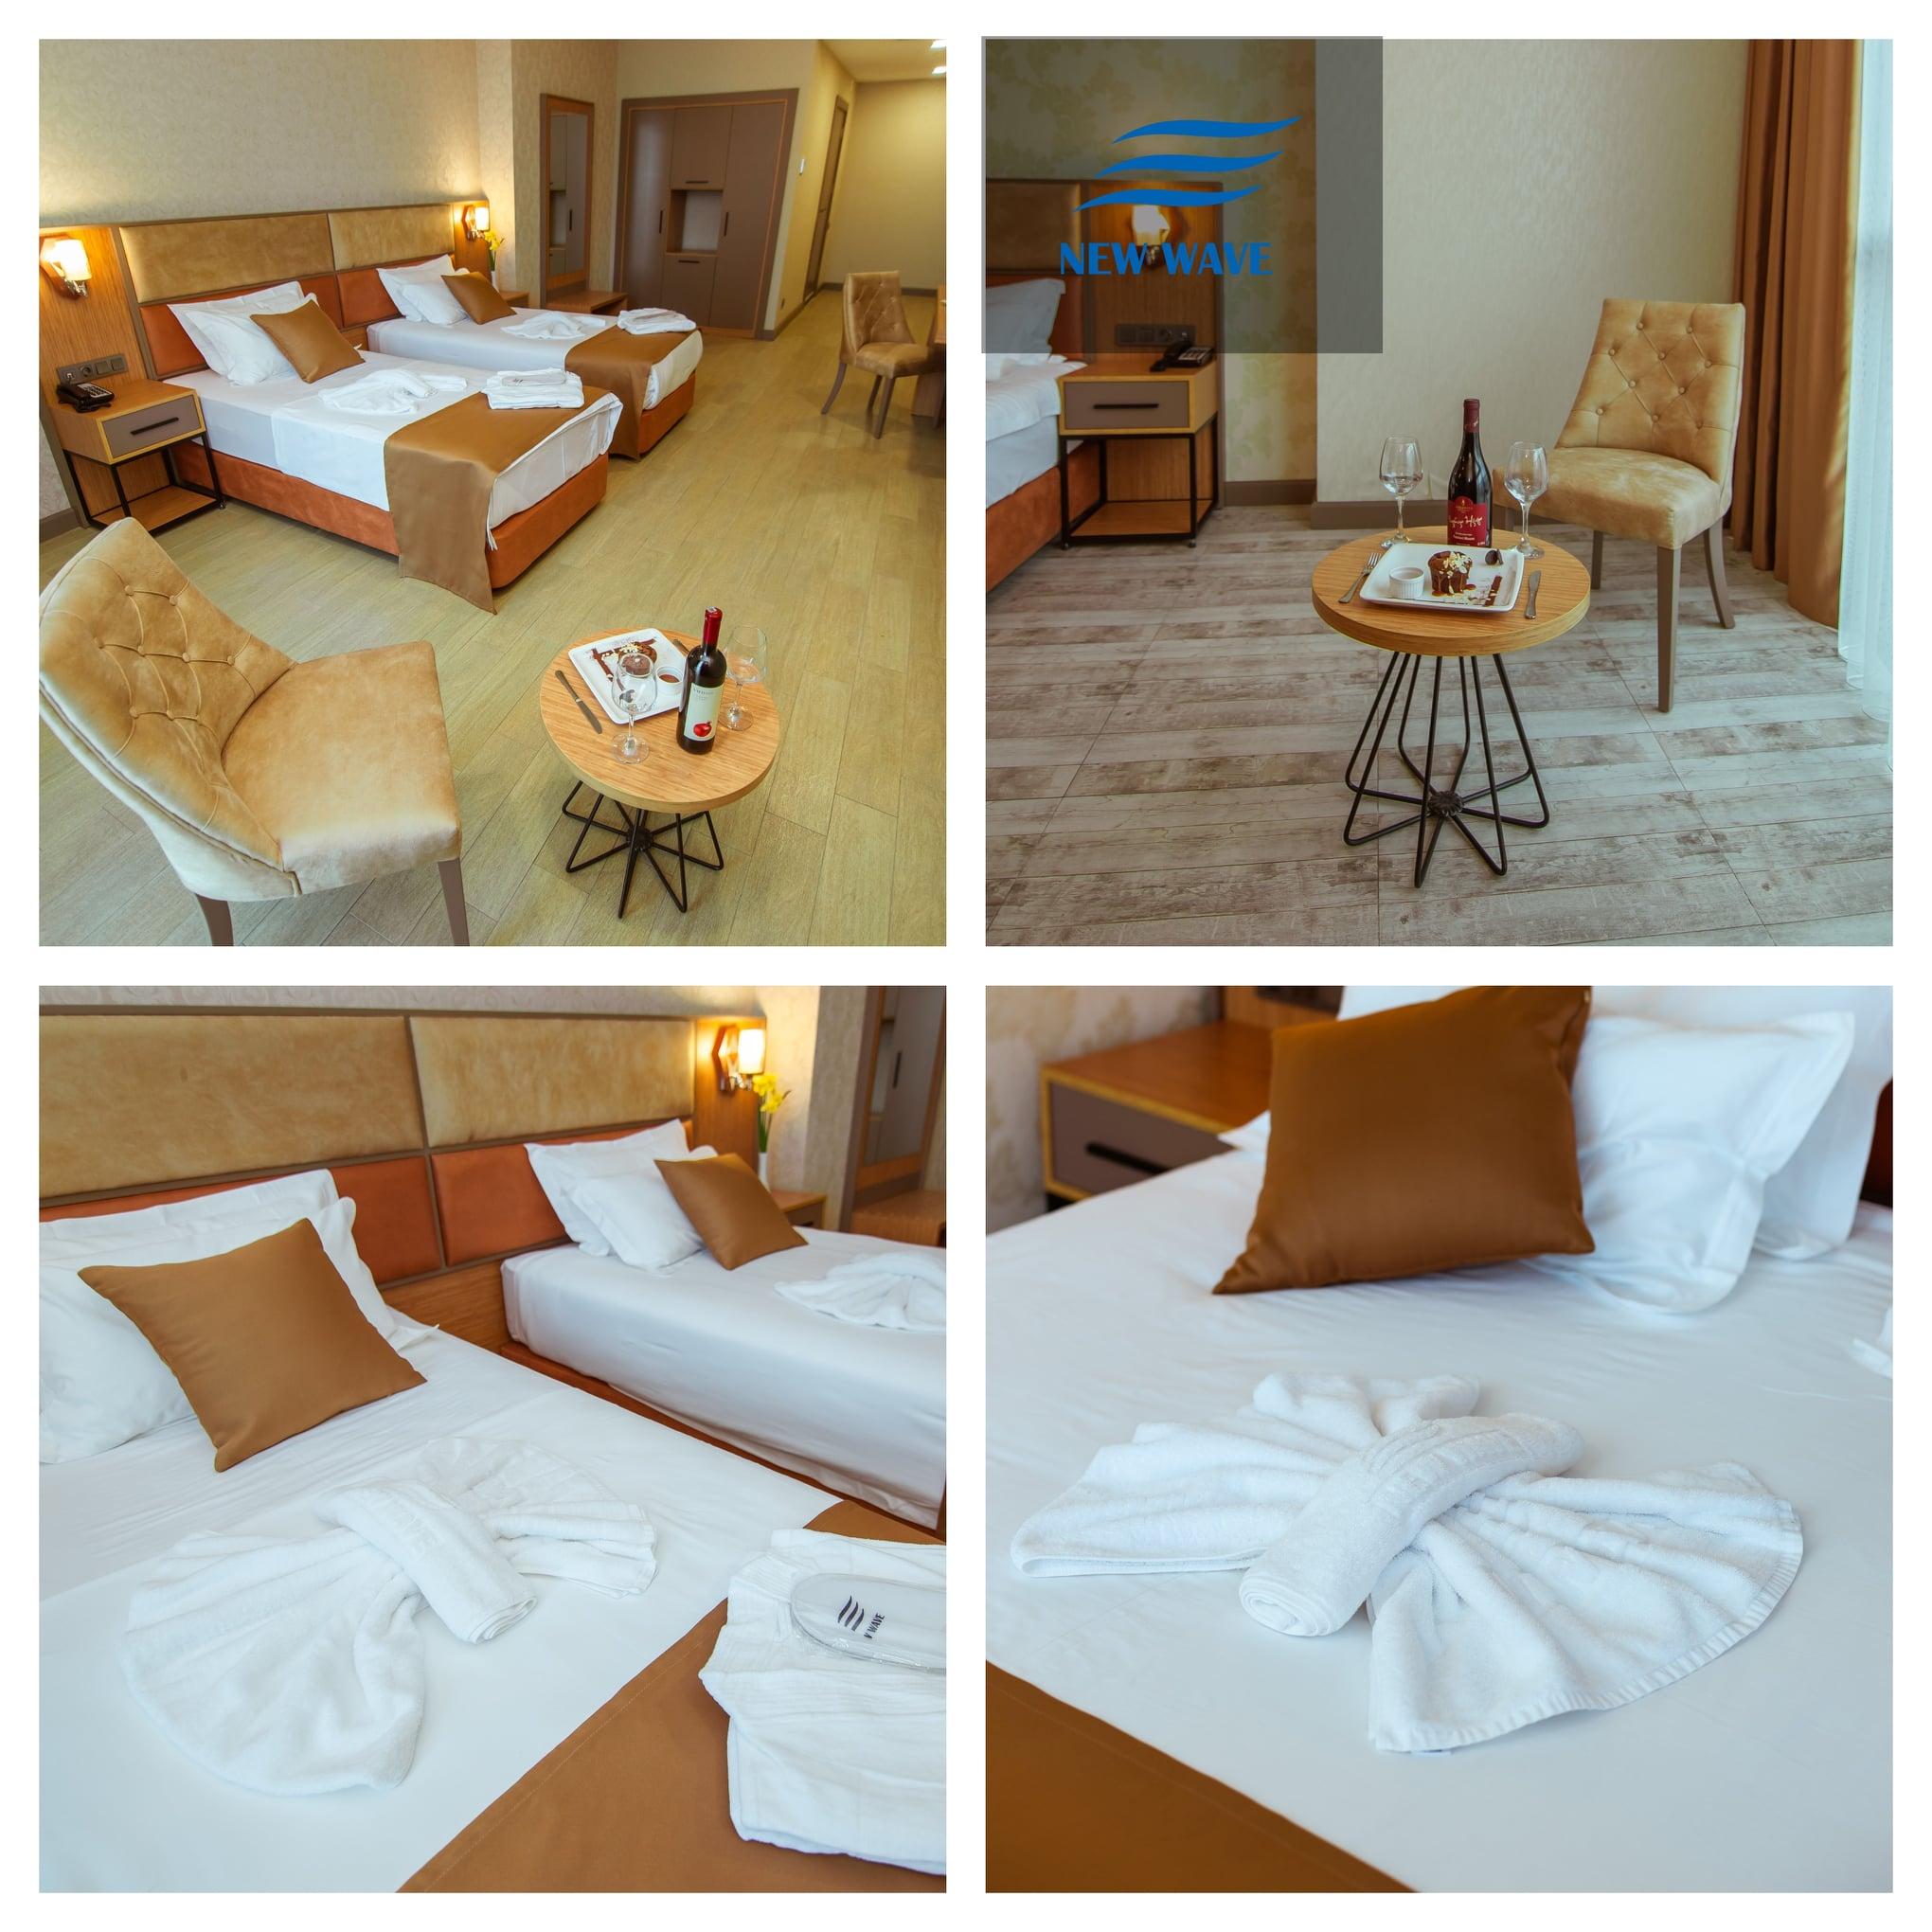 New Wave Hotel Batumi